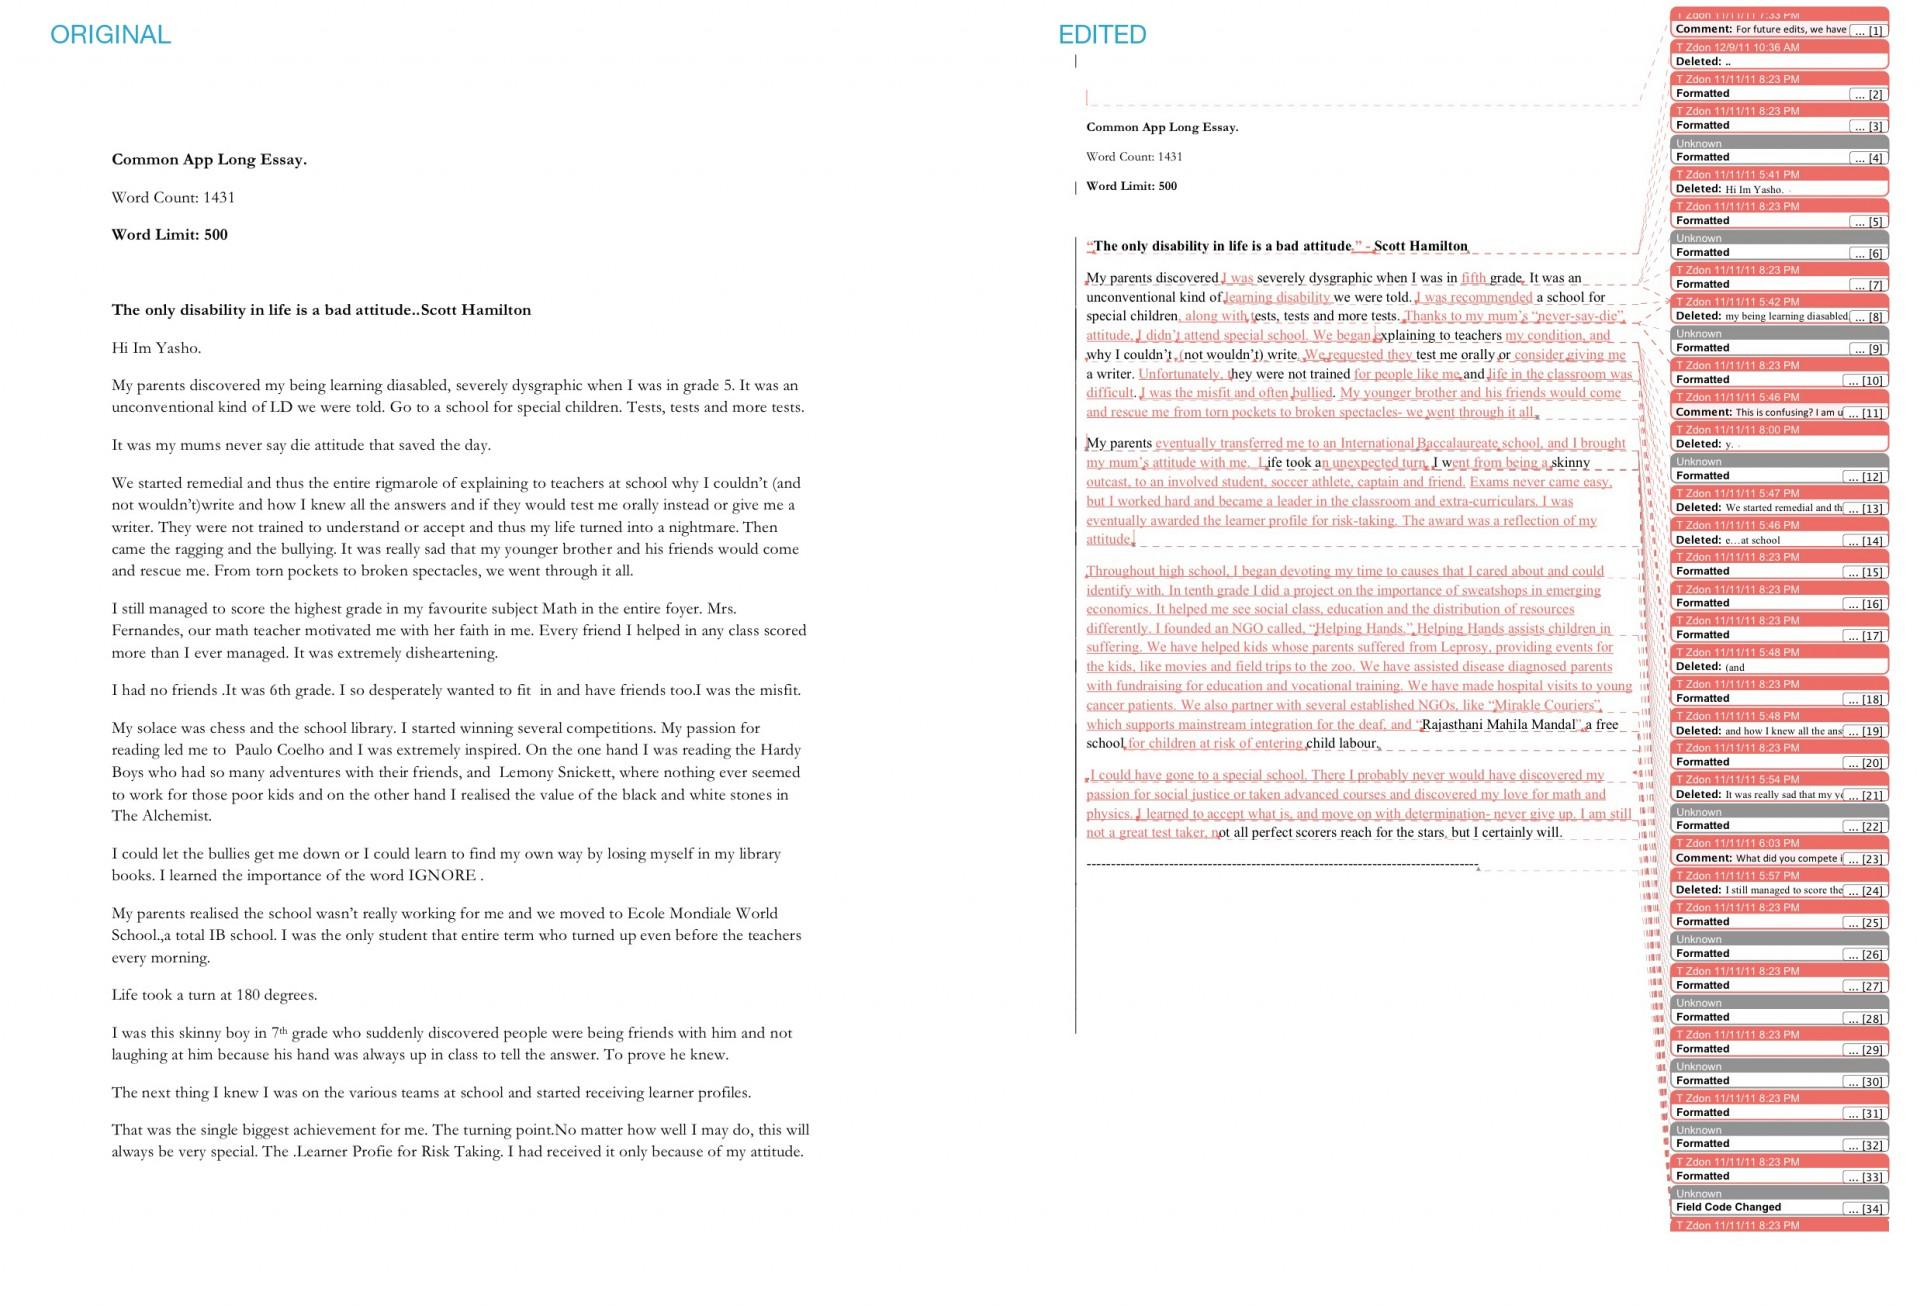 012 Common App Essay Questions Application Dreaded 2017 2017-18 1920